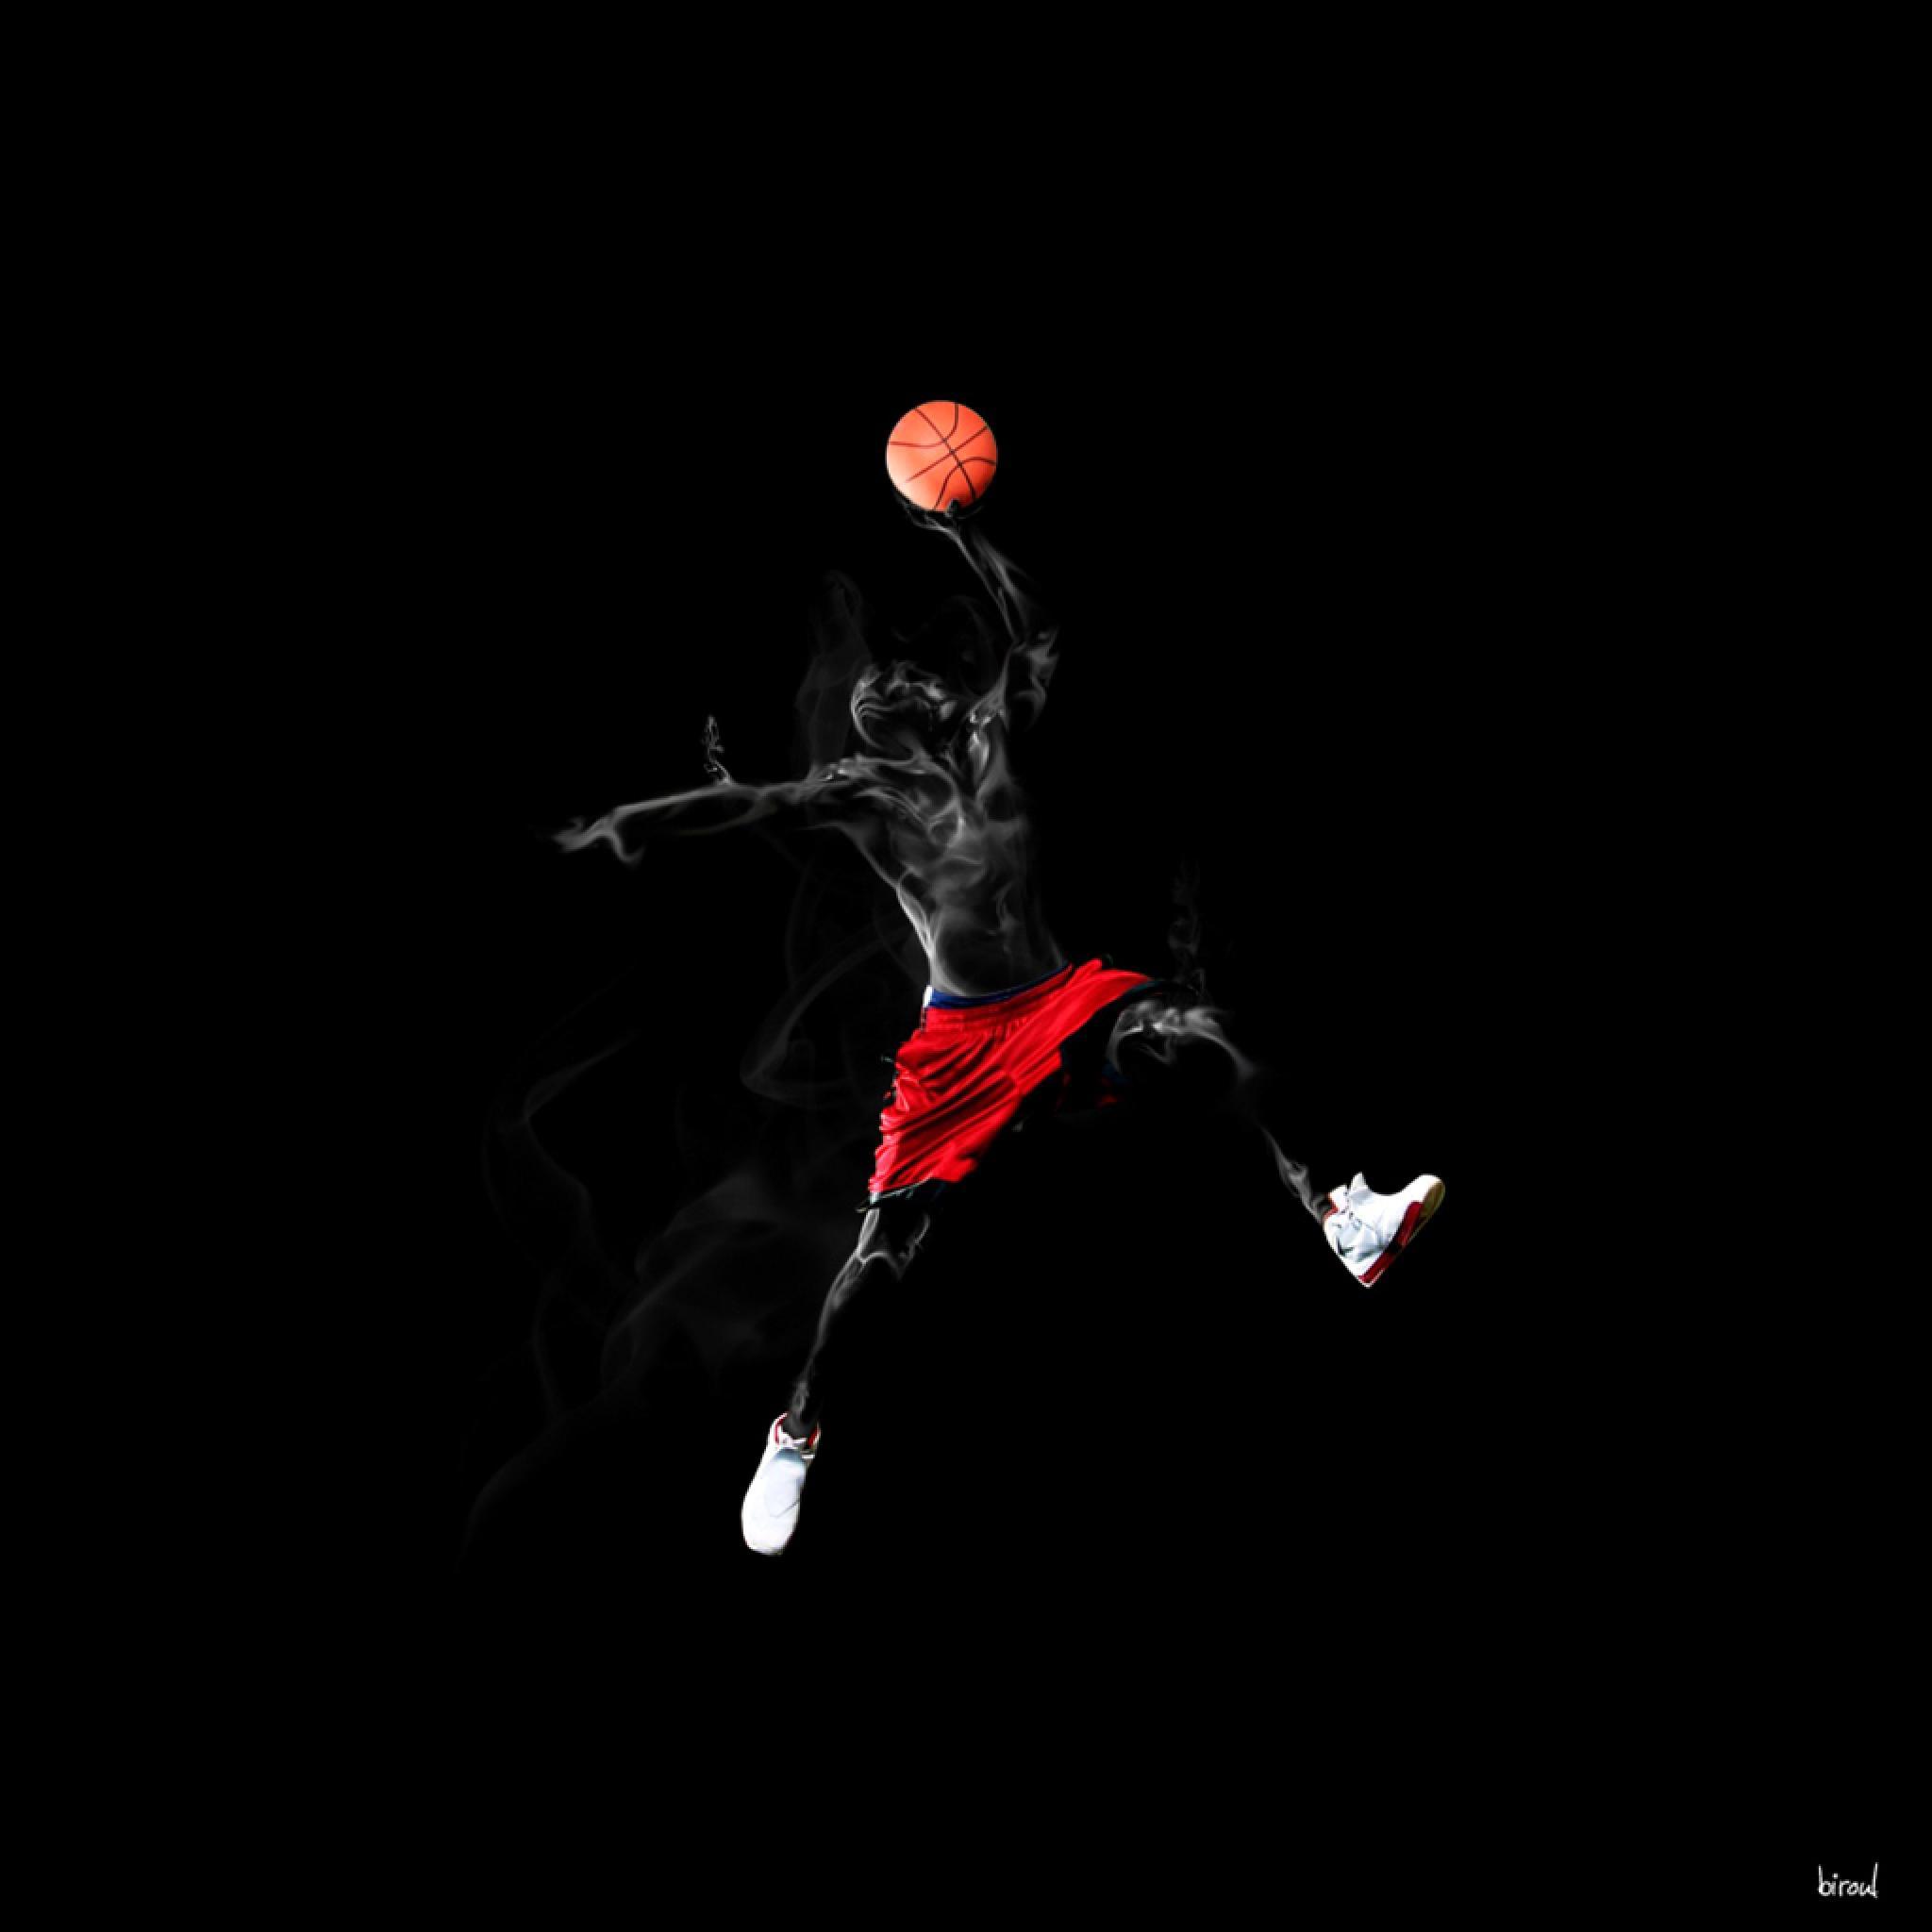 Cool Basketball Wallpapers: Best Basketball Wallpapers